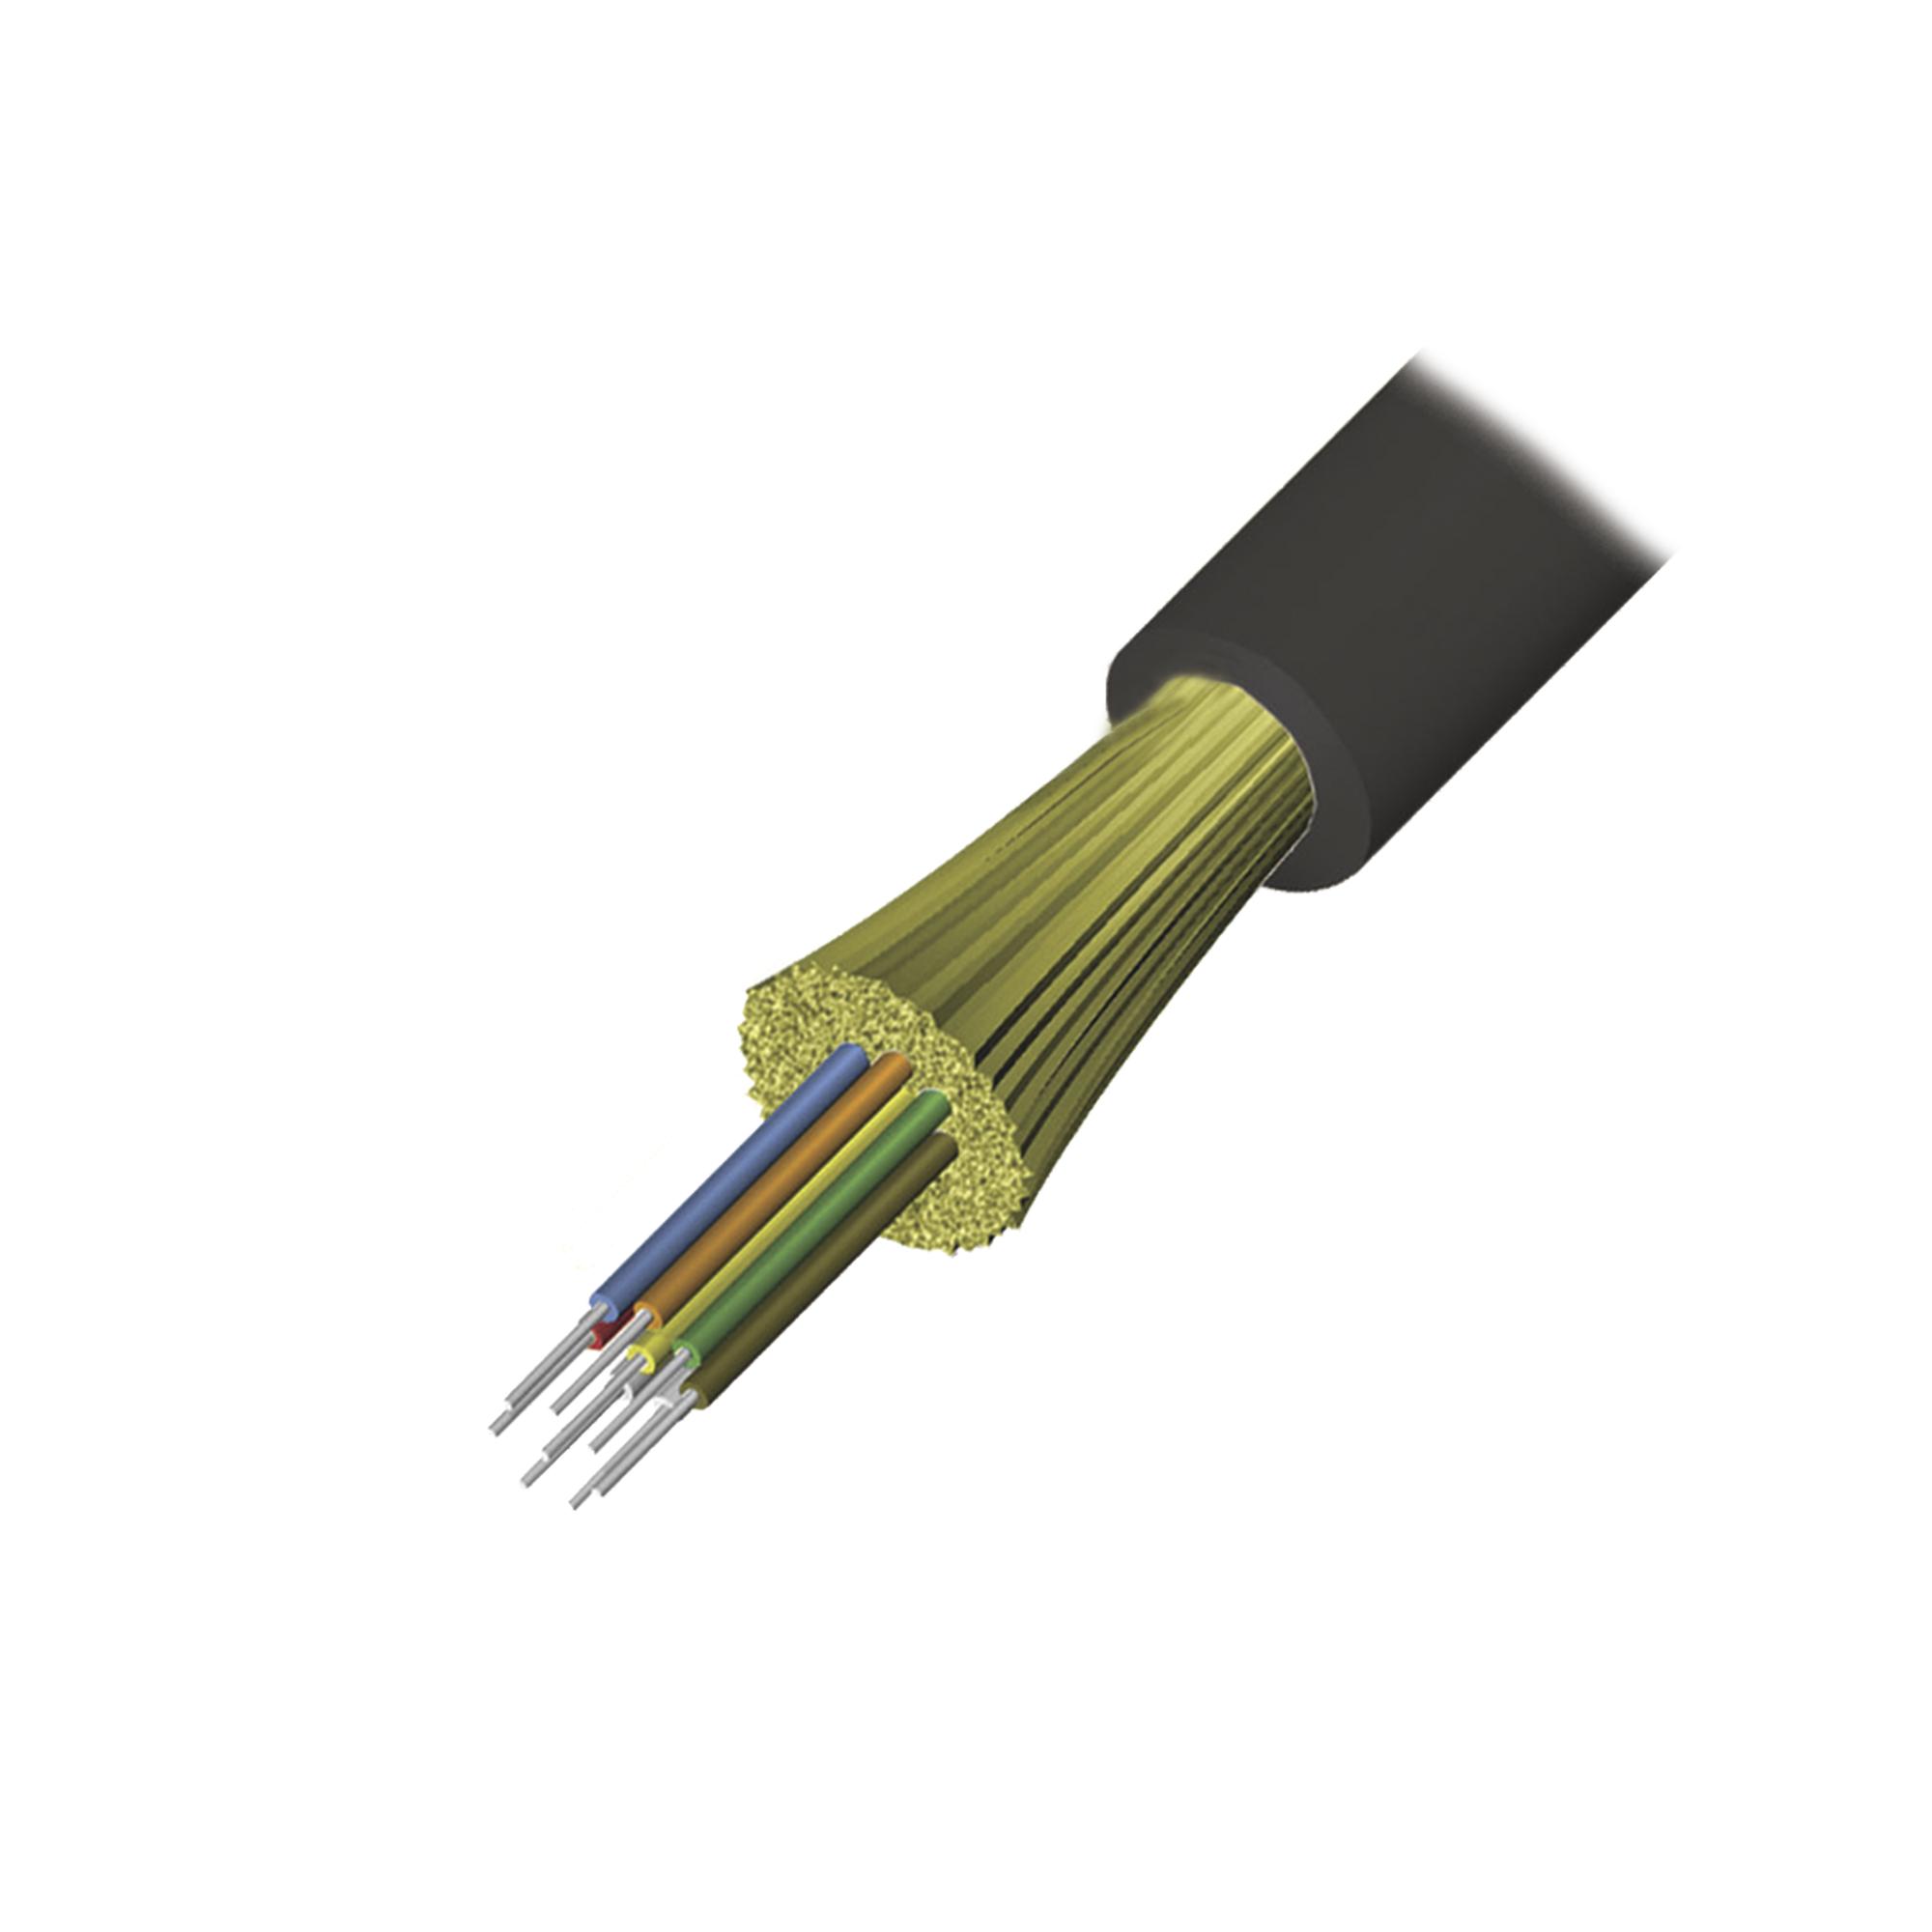 Cable de Fibra optica de 12 hilos, Interior/Exterior, Tight Buffer, No Conductiva (Dielectrica), Plenum, Multimodo OM4 50/125 optimizada, 1 Metro